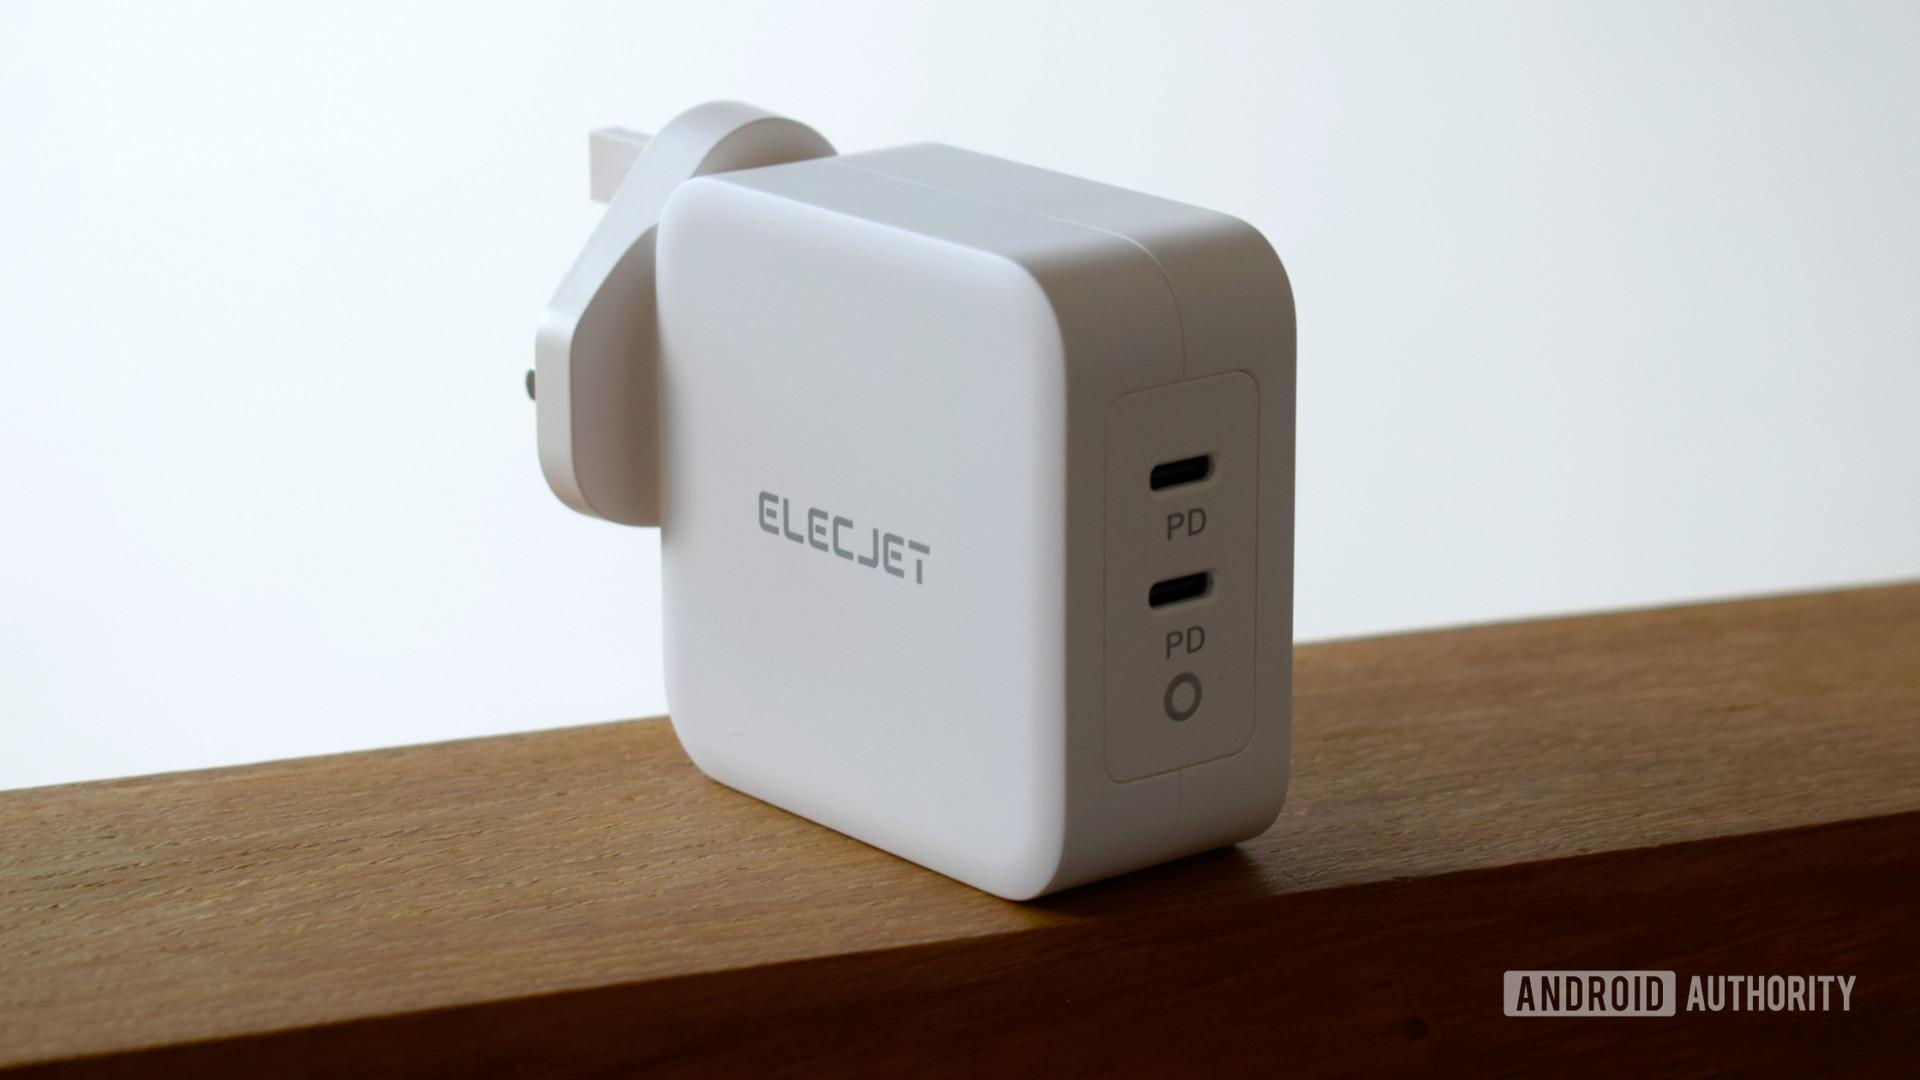 Electjet 100W USB C PD Power Adapter review ports